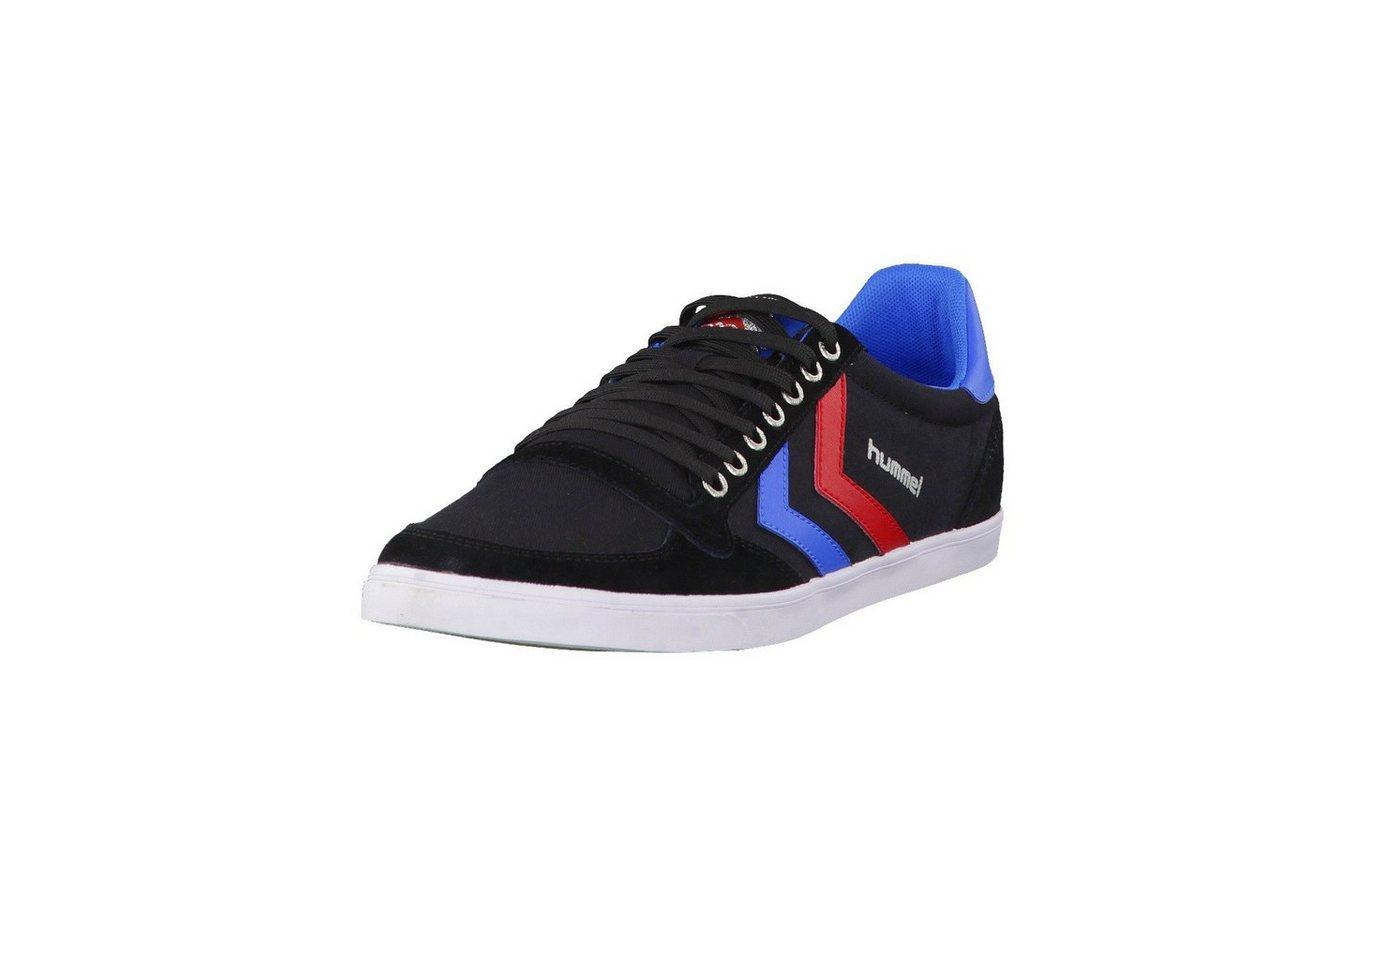 Damen Hummel Sneaker schwarz   05700493088367